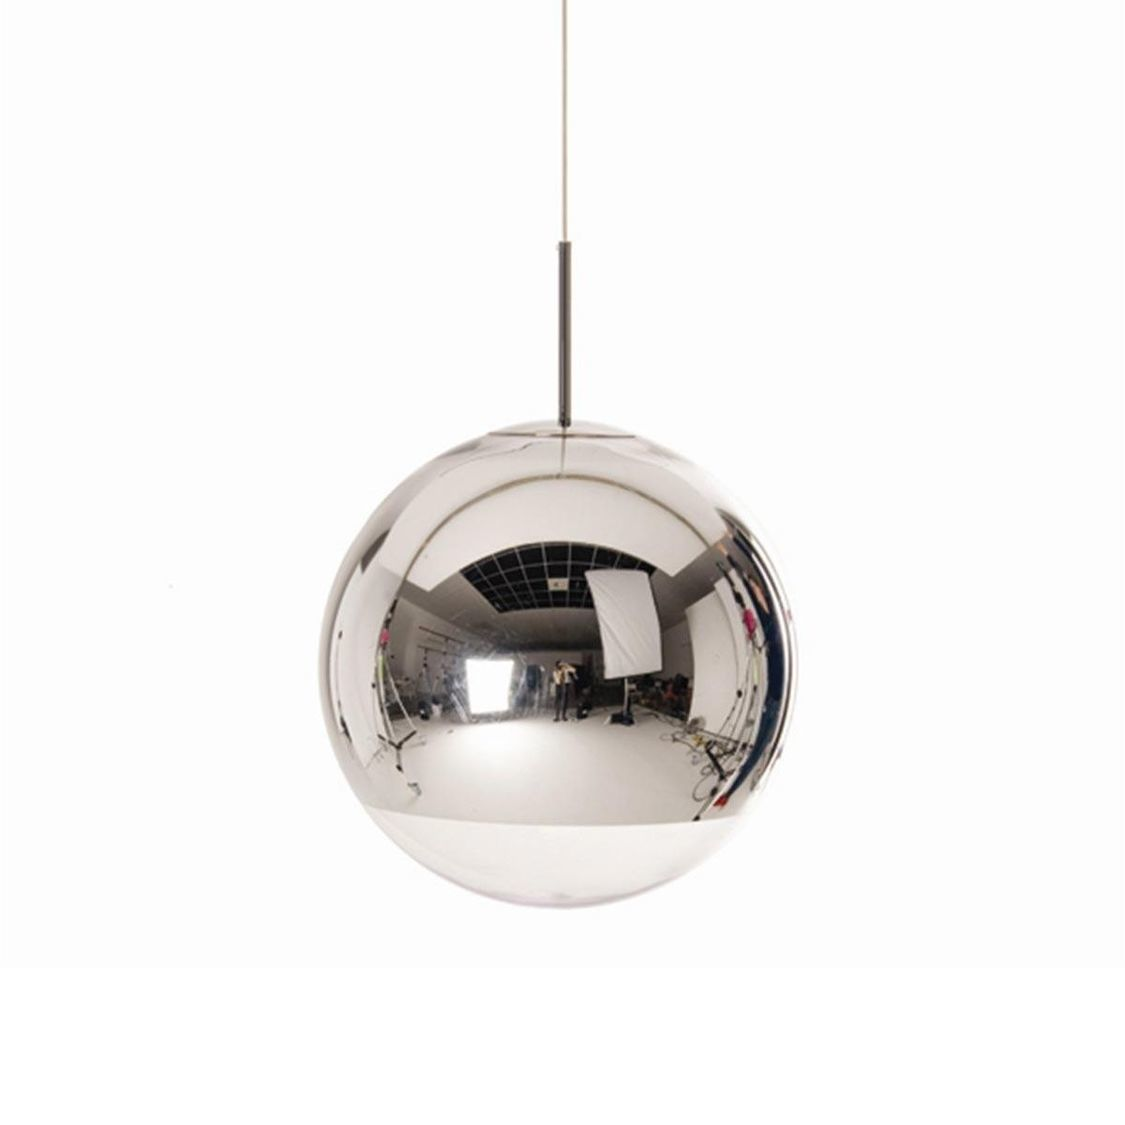 mirror ball pendant pendelleuchte chrom tom dixon. Black Bedroom Furniture Sets. Home Design Ideas